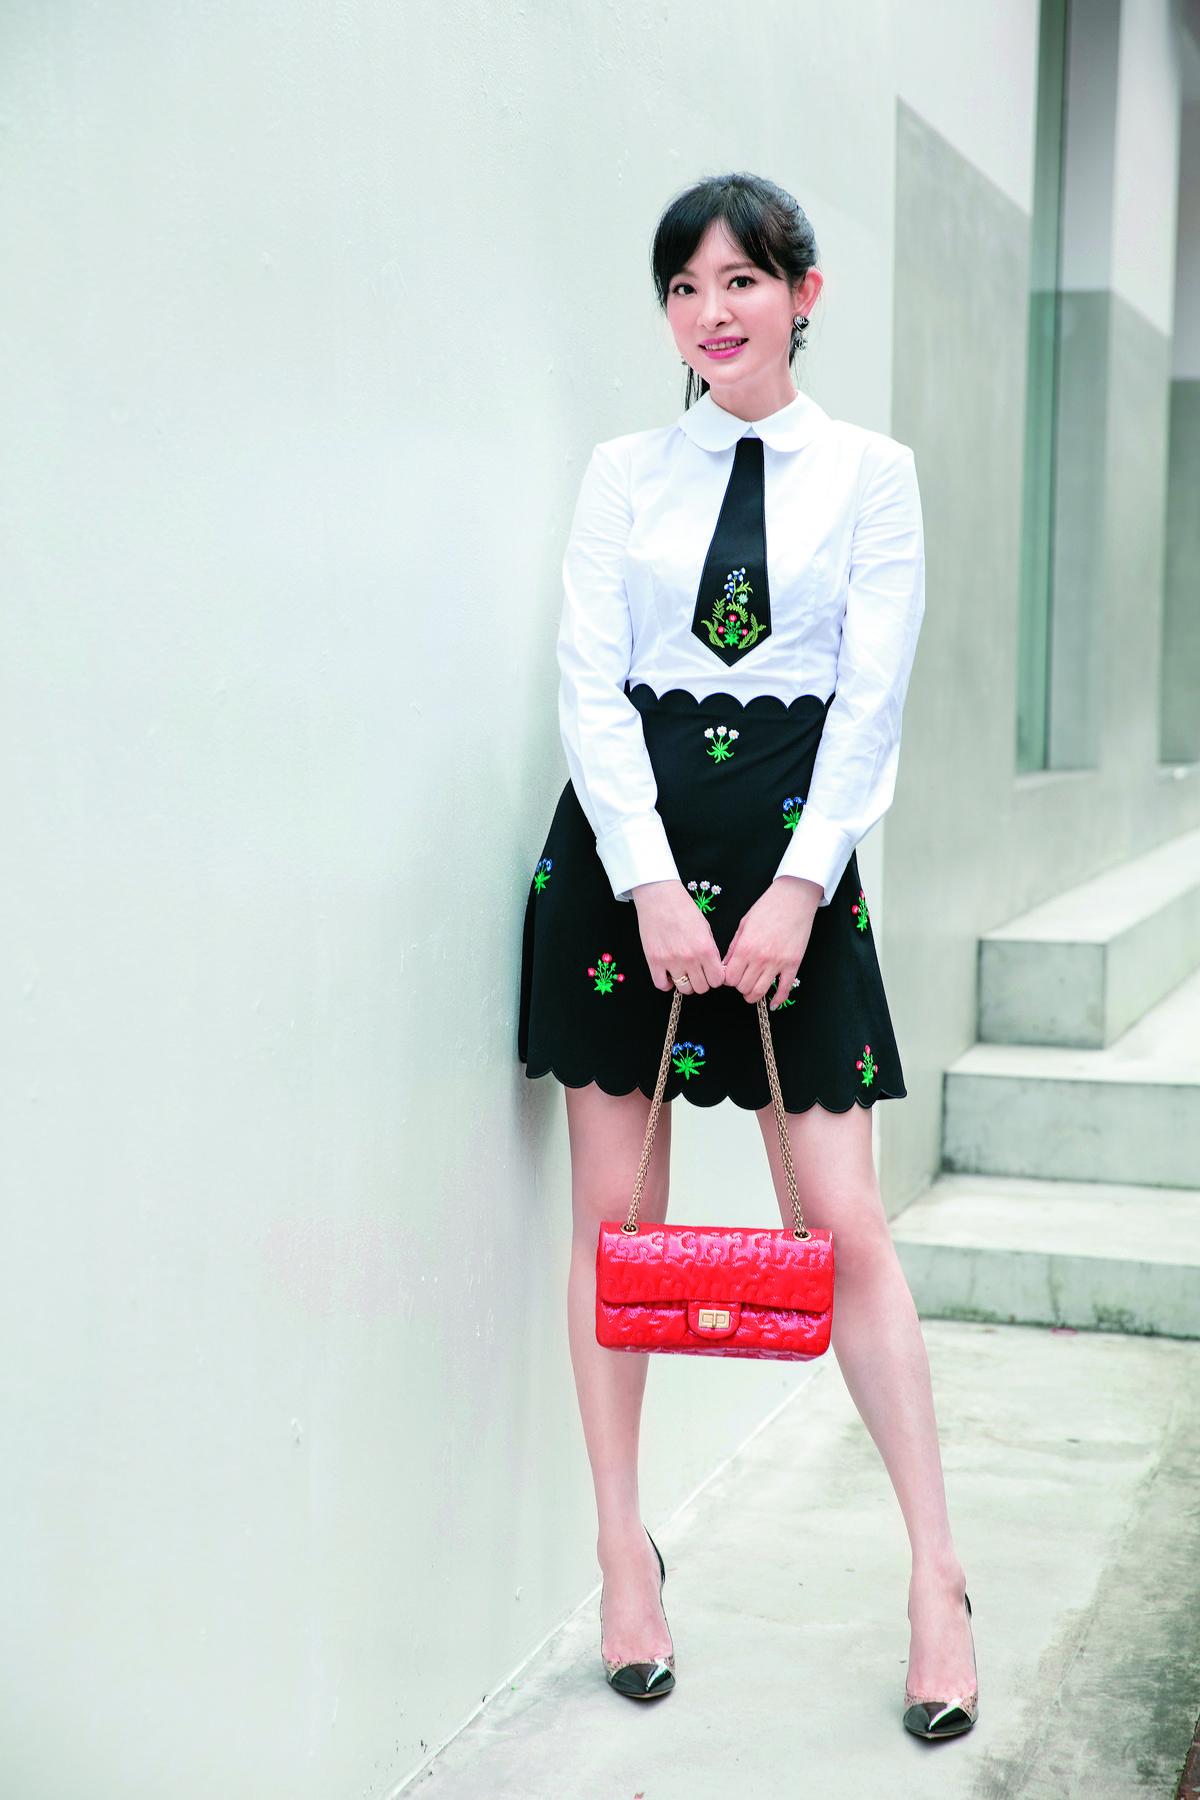 【Thursday-賣萌學生妹】全身行頭 NT$150,000。洋裝:VIVETTA白衣黑裙洋裝-約NT$28,000/耳環:CHANEL愛心造型垂墜耳環-約NT$10,000/包款:CHANEL紅色鍊帶包-約NT$100,000/鞋子:Gianvito Rossi高跟鞋-約NT$12,000